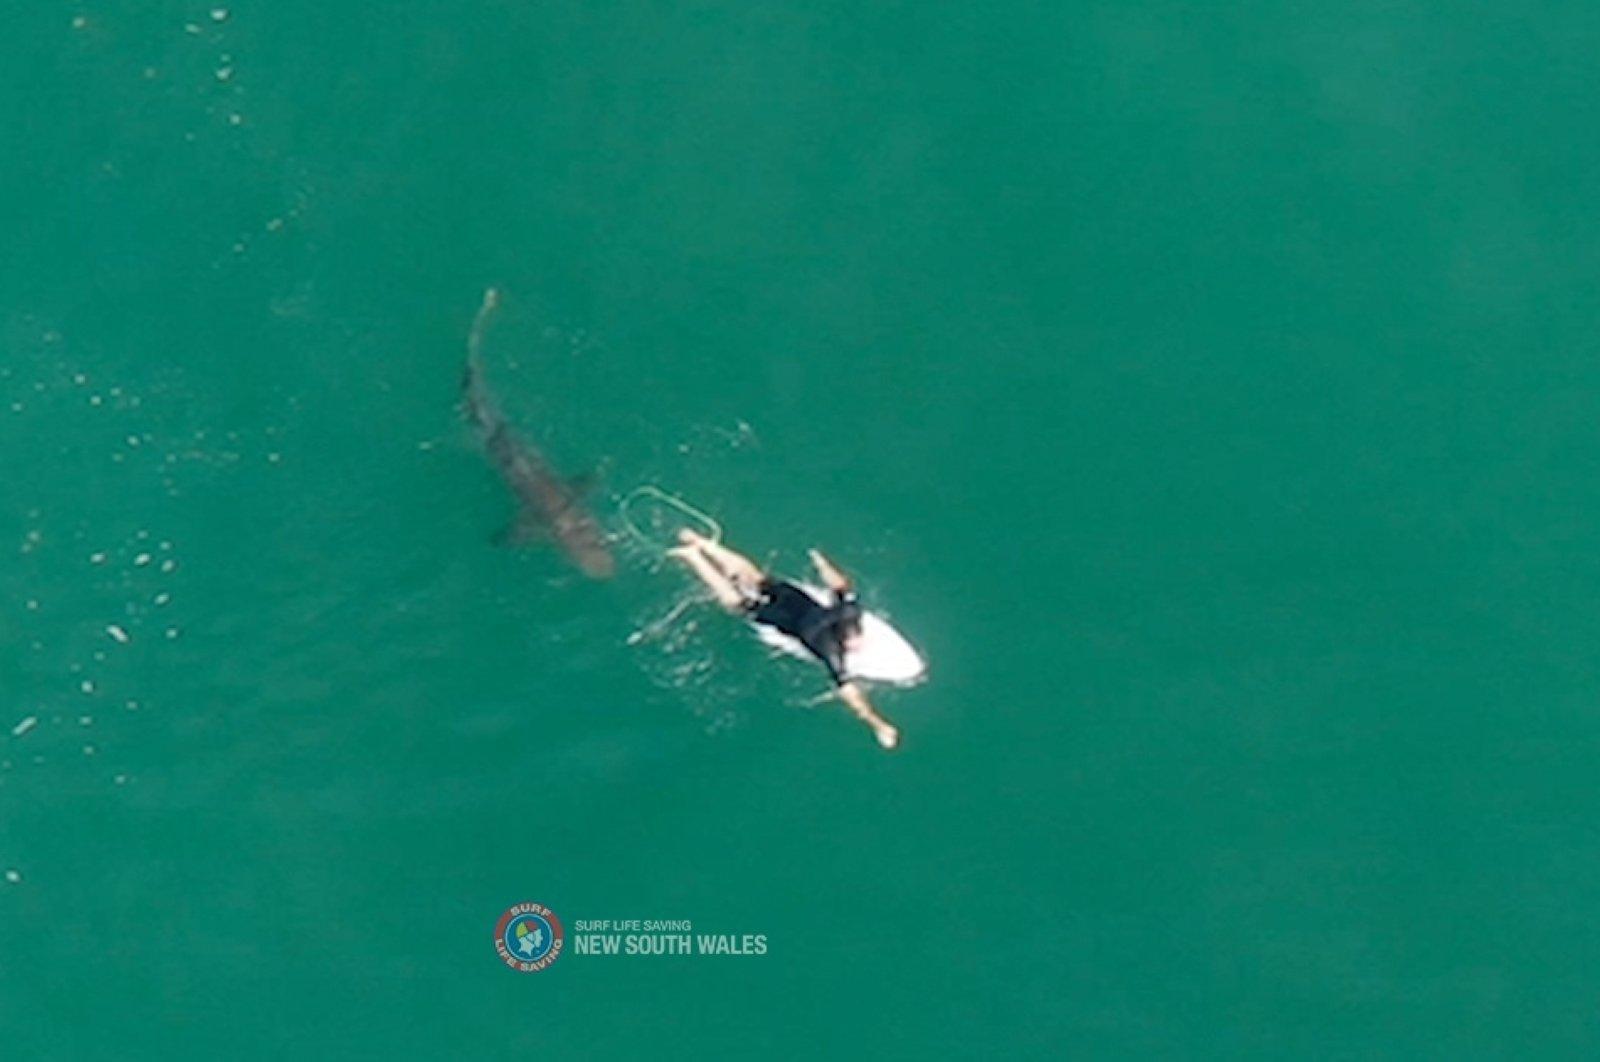 A shark swims close to world championship tour surfer Matt Wilkinson at Sharpes Beach, New South Wales, Australia, Oct. 7, 2020. (Surf Life Saving NSW via Reuters)